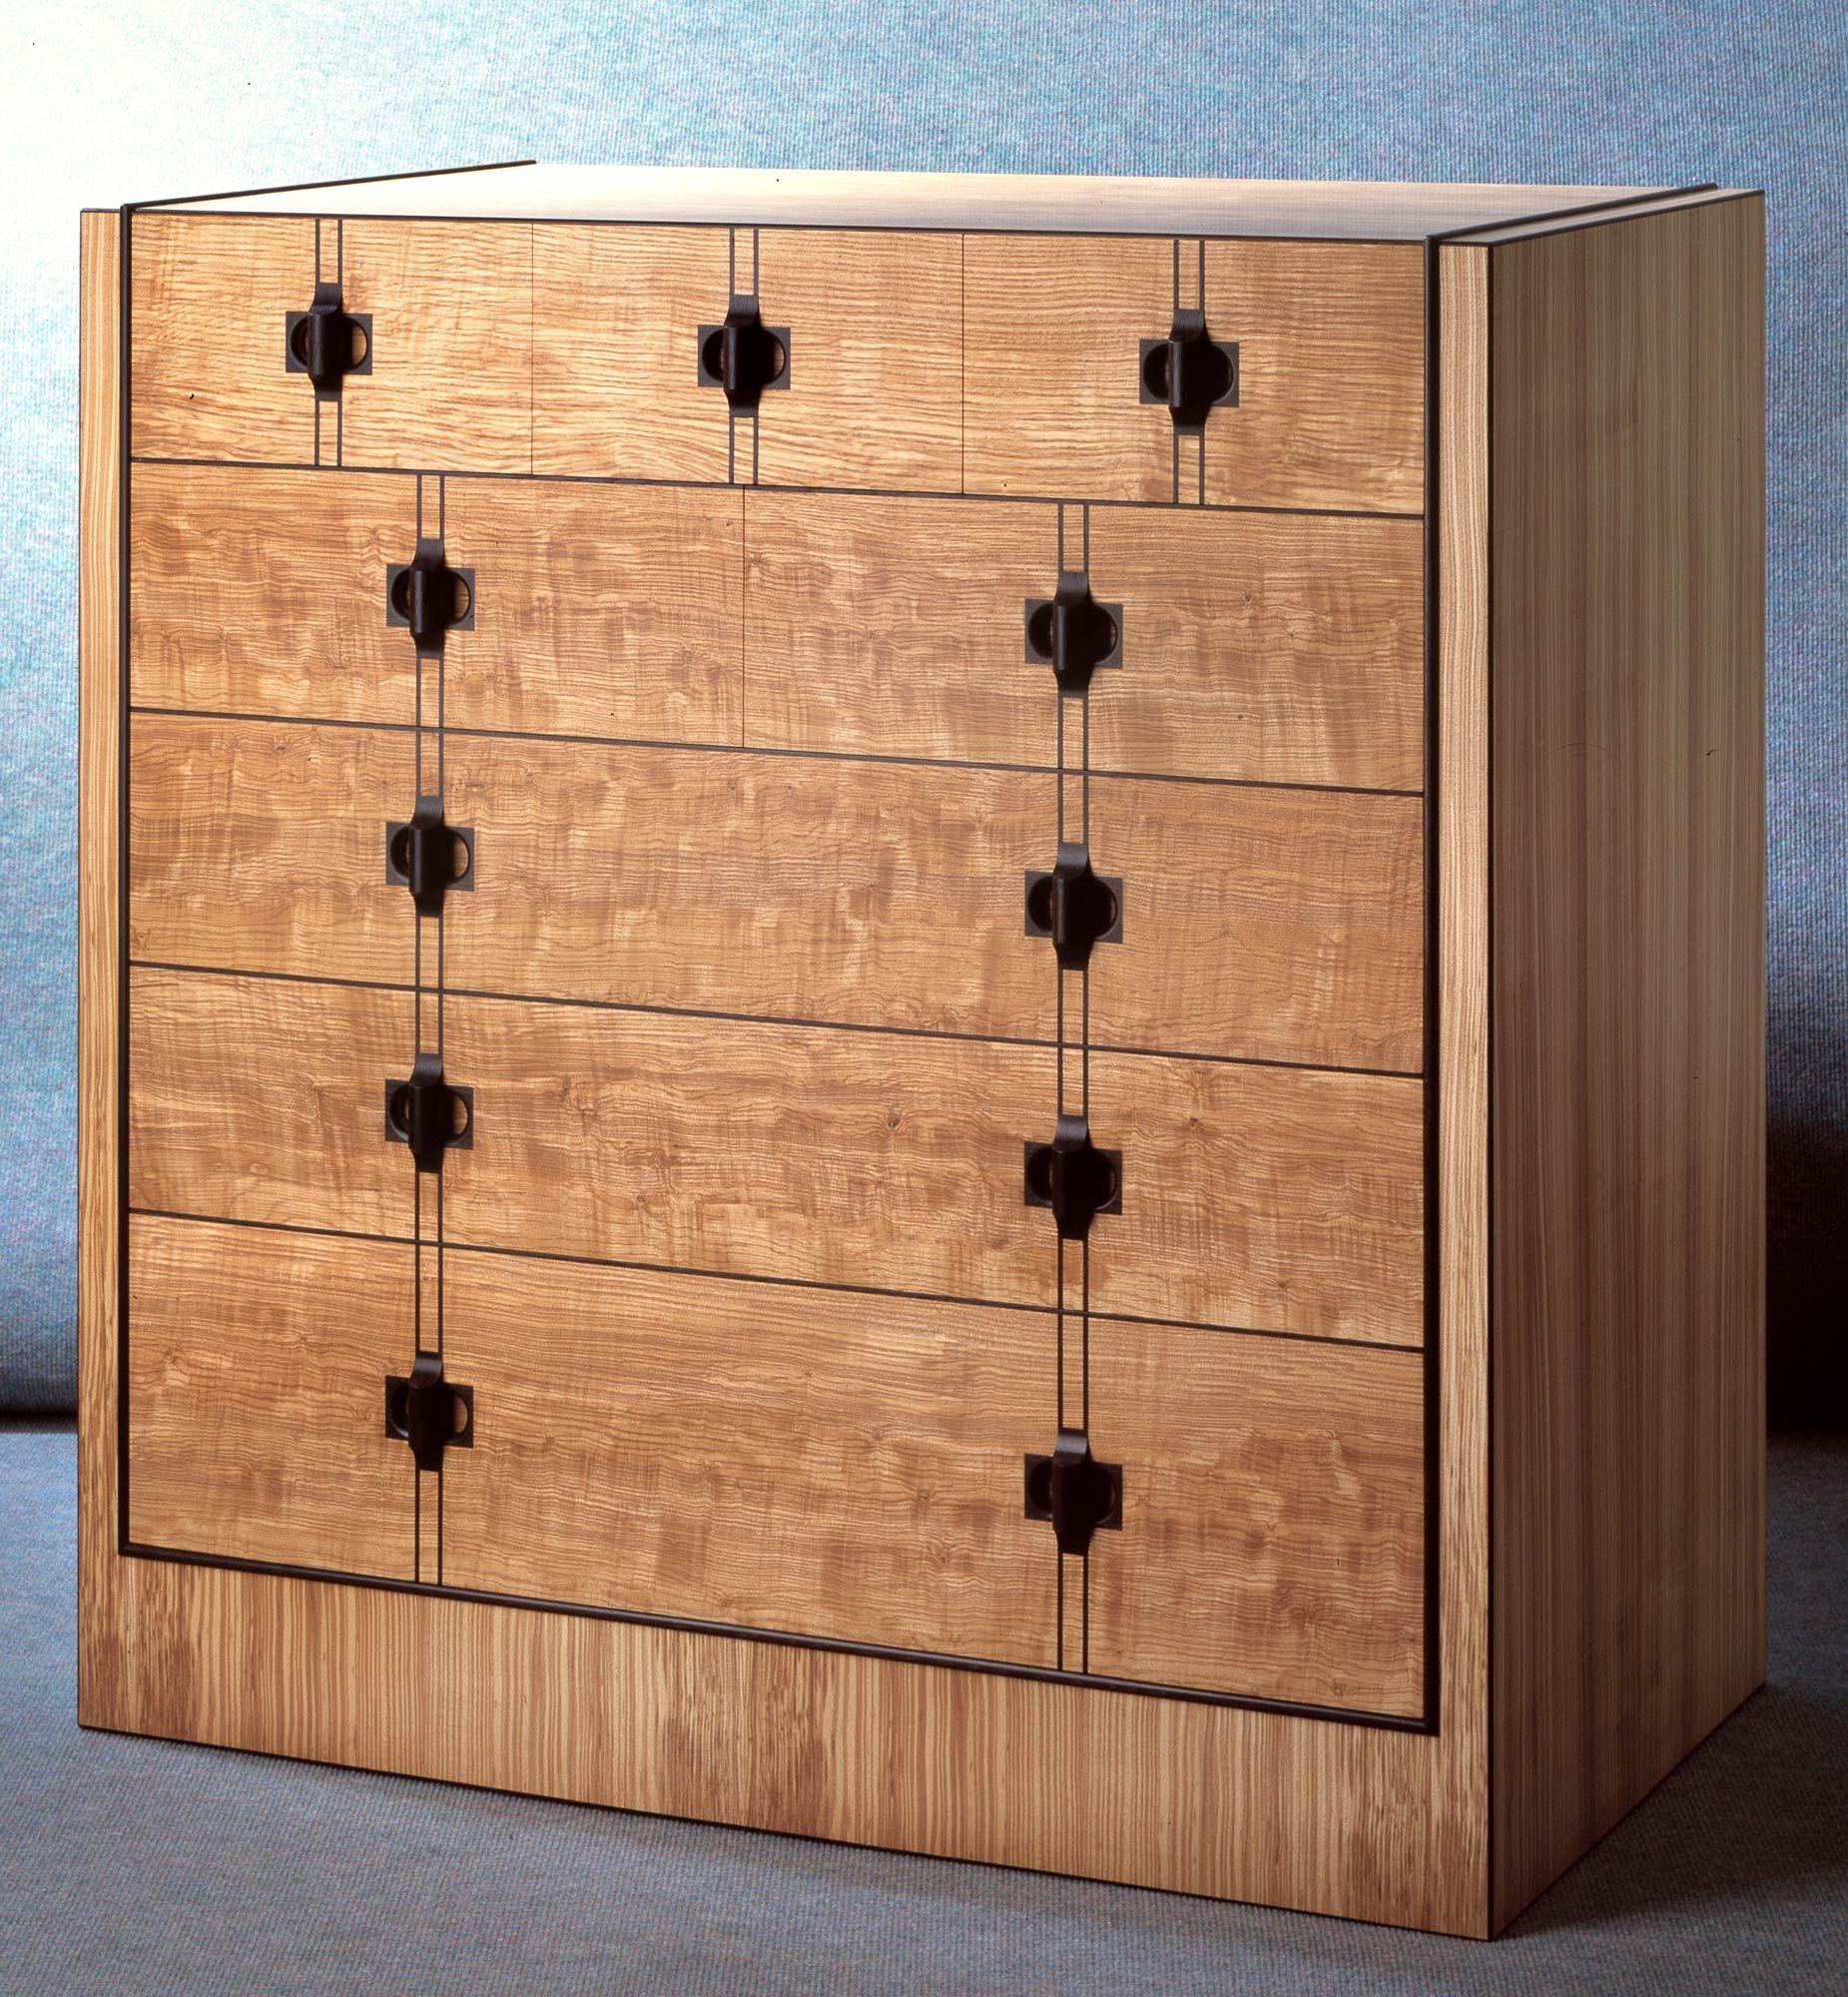 Bespoke Tamo Chest Of Drawers By Furniture Designer Robert Ingham